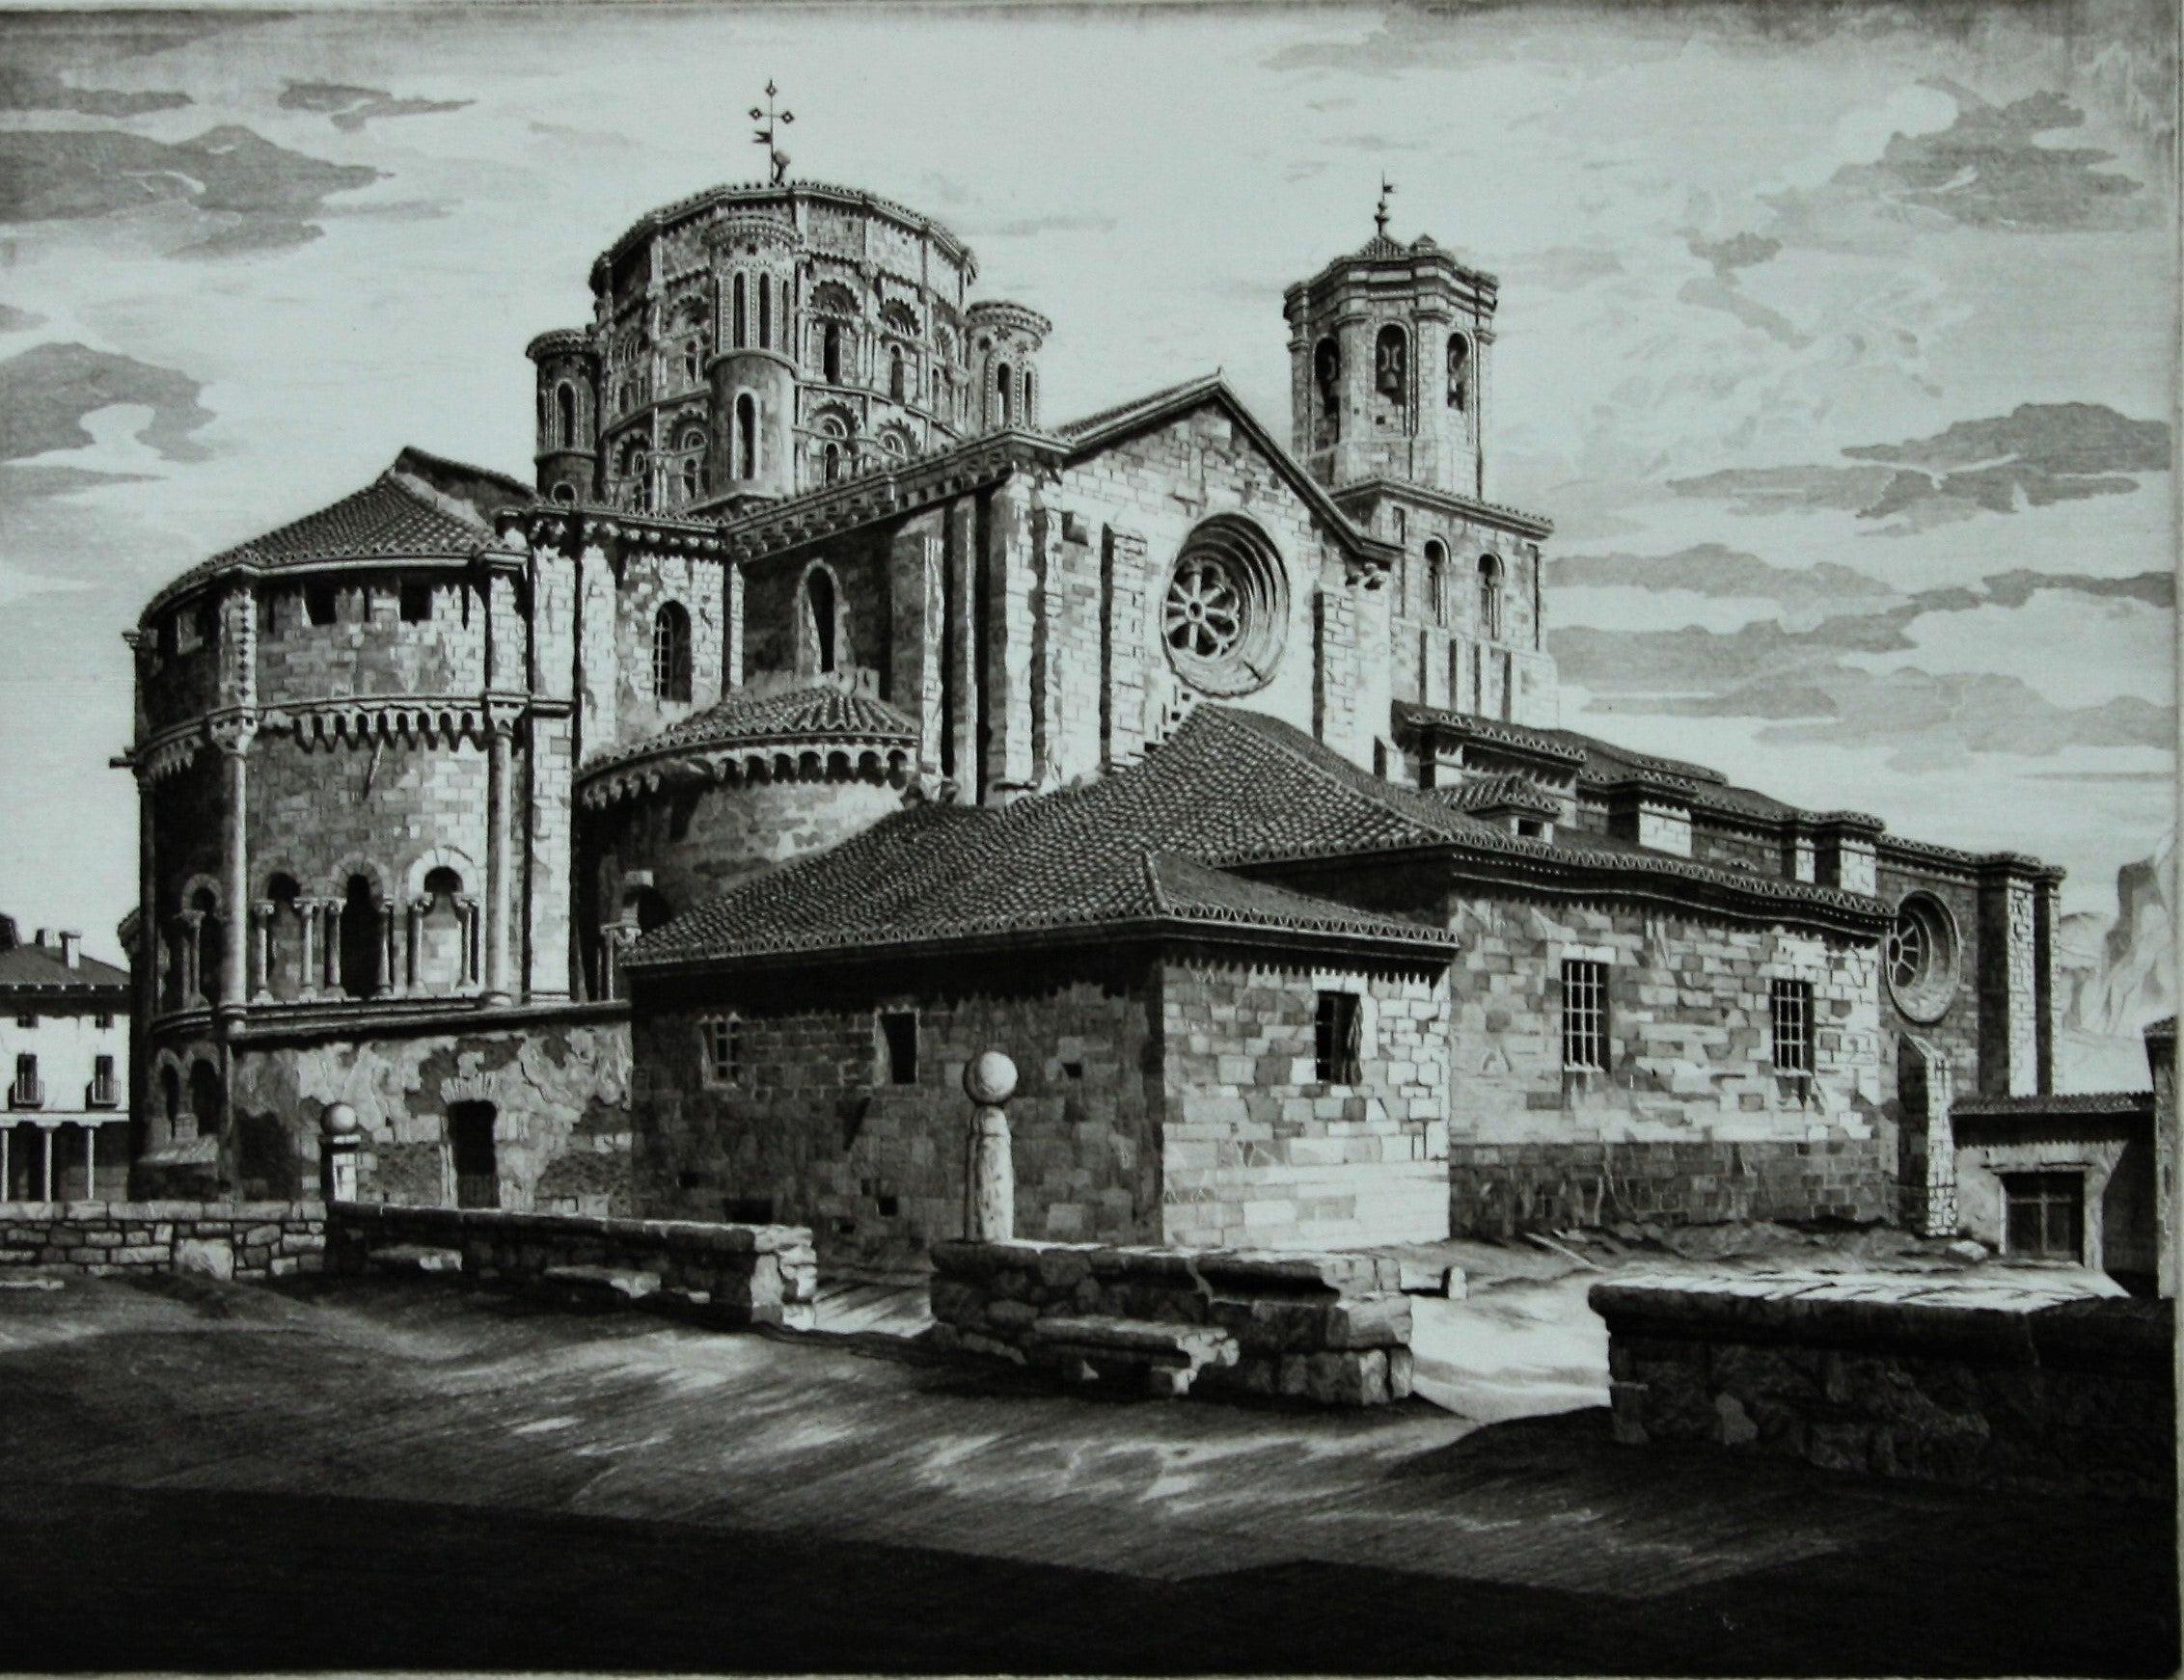 La Colegiata, Toro [Spain]